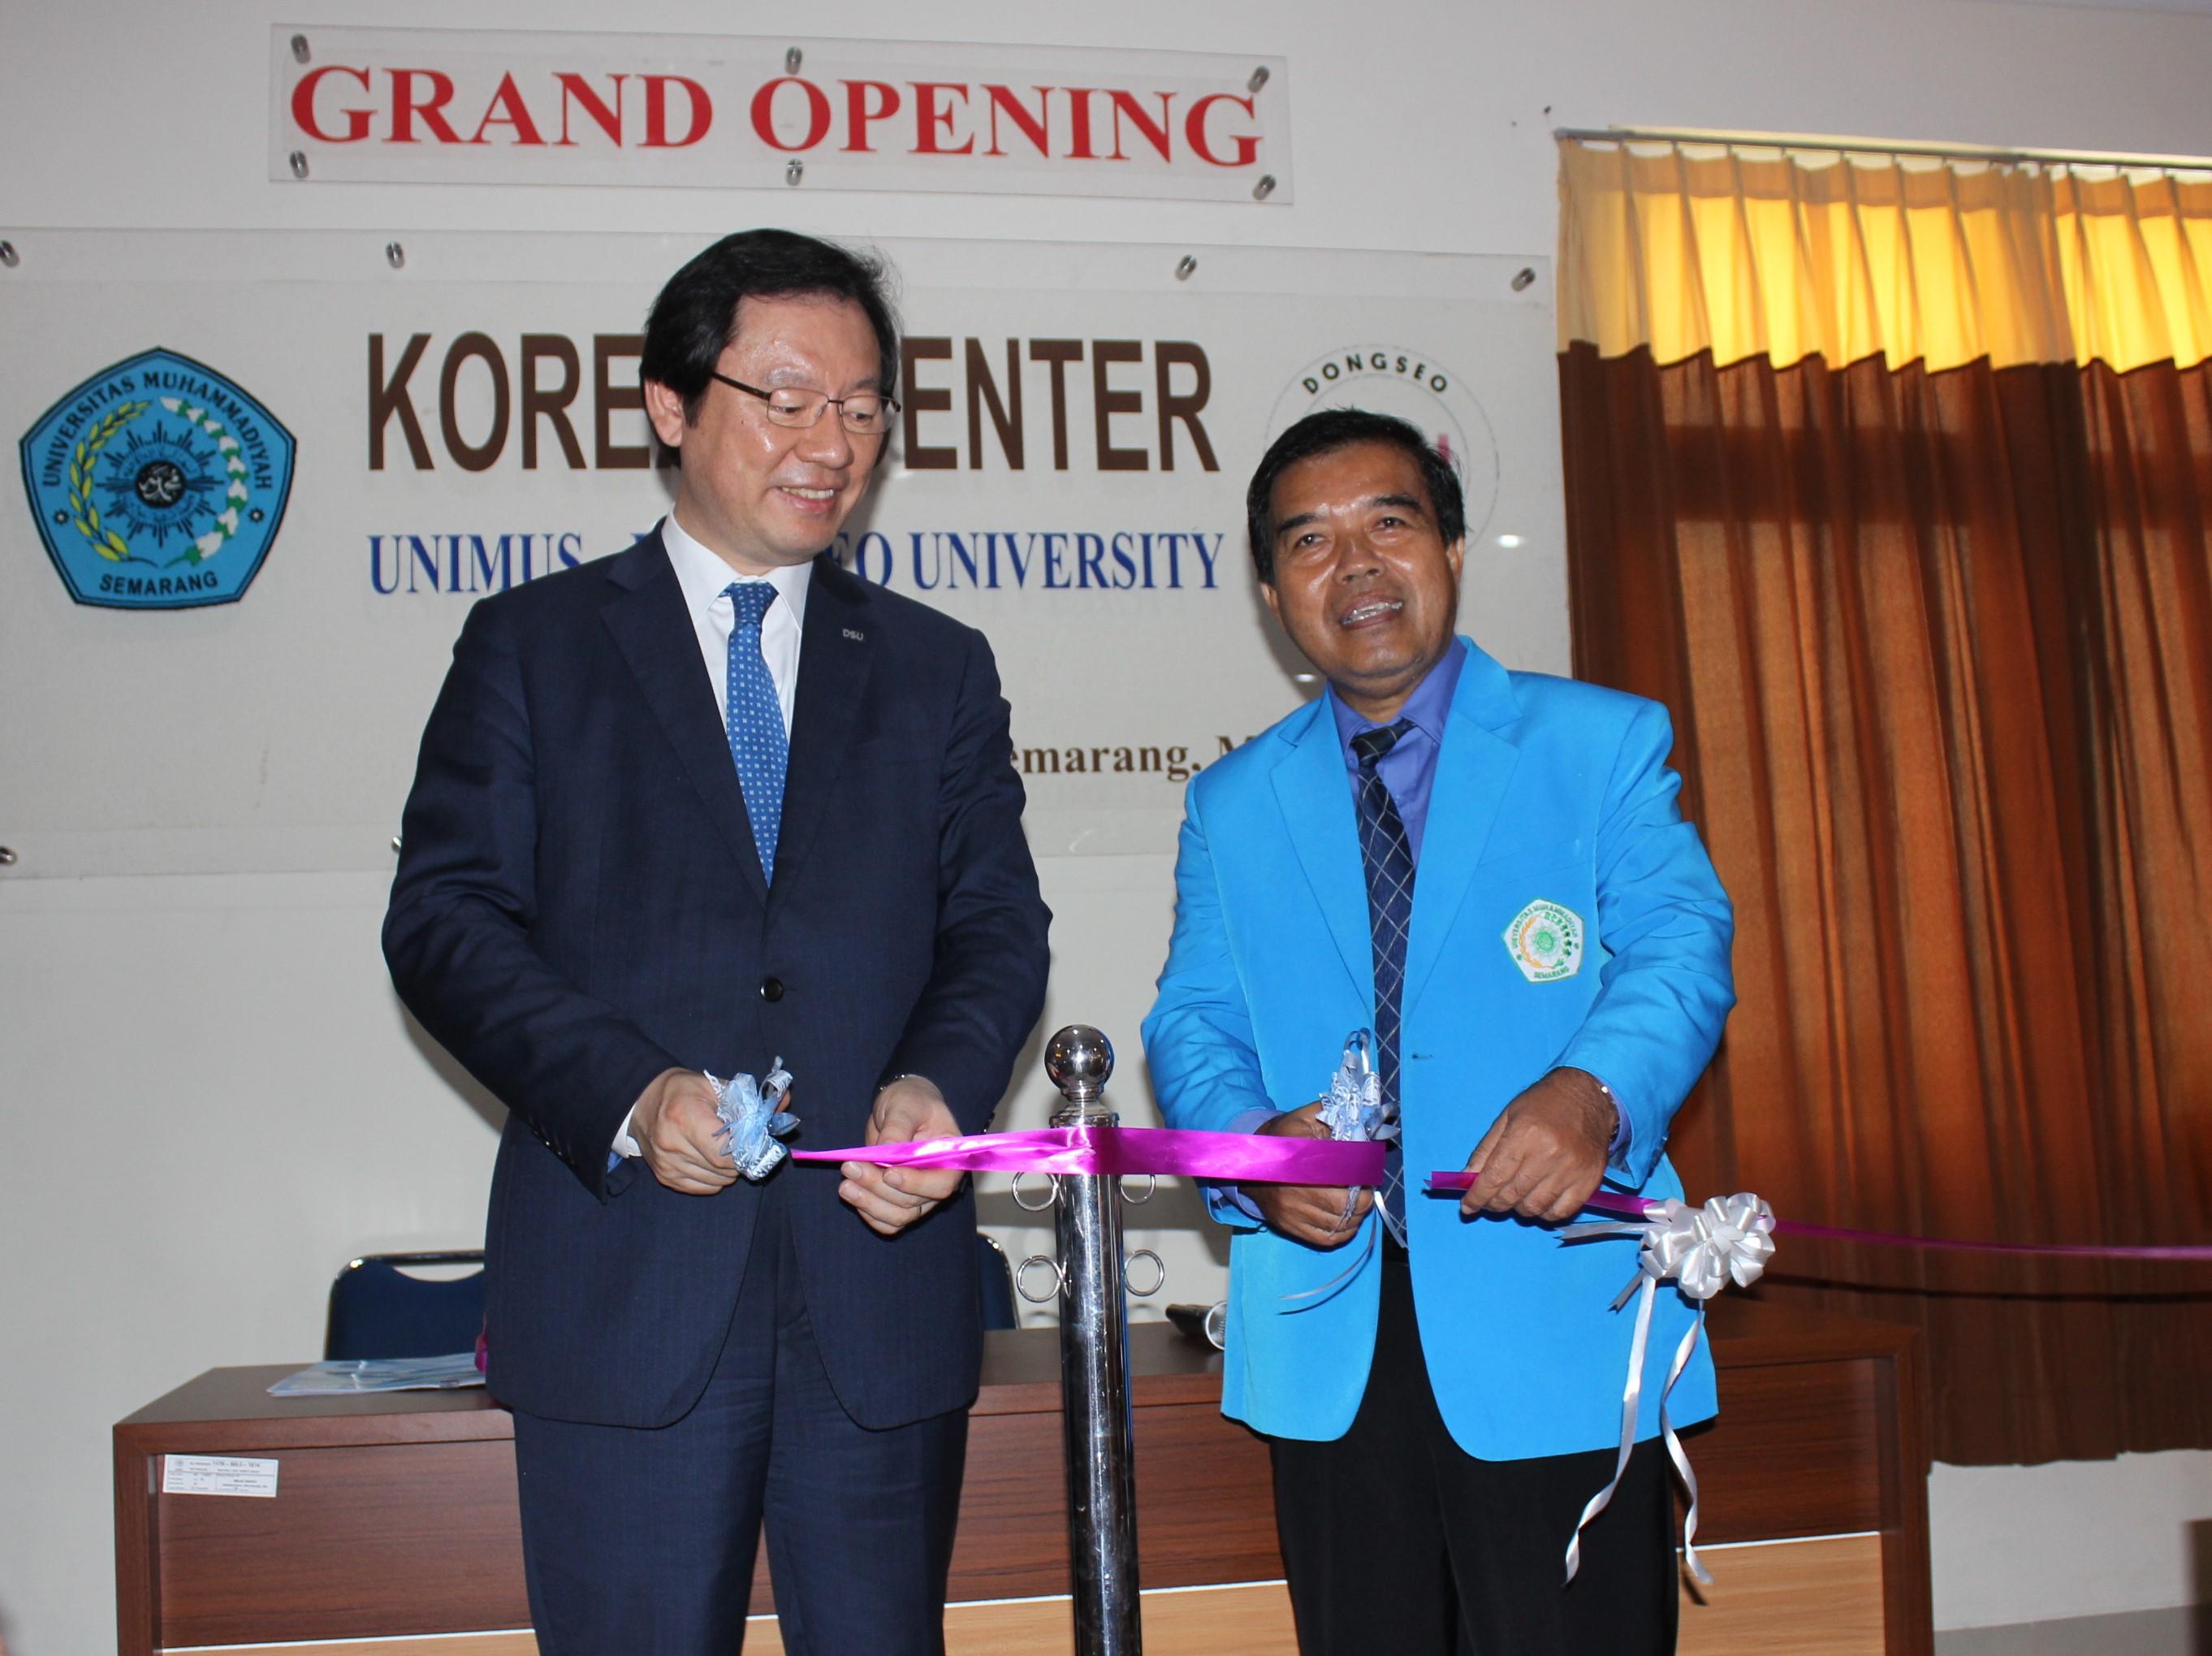 1.Pemotongan Pita sebagai tanda perseminan Korean Center oleh presiden DSU dan Rektor Unimus